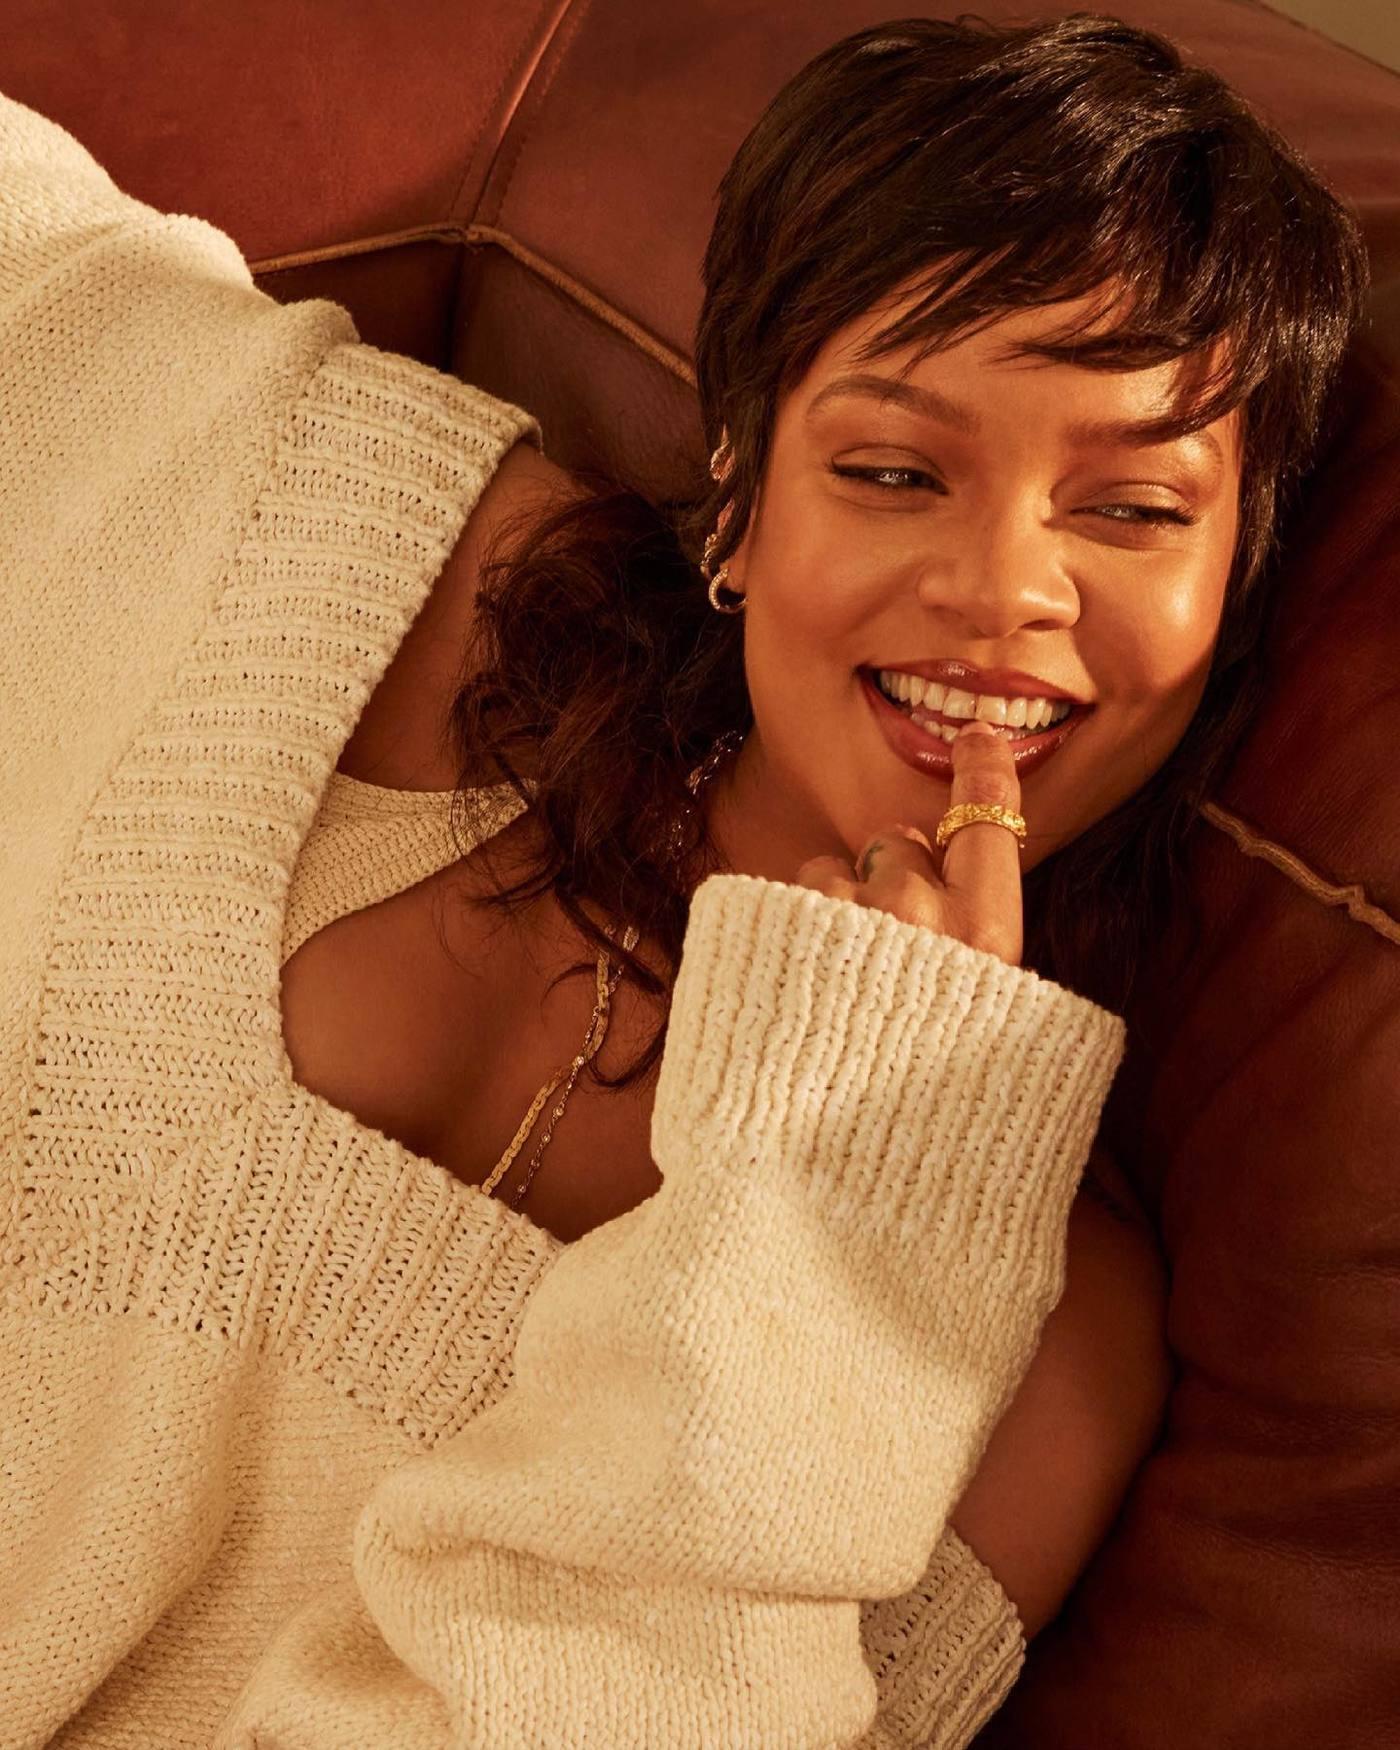 Eaze Drop Blurring Skin Tint: el secreto mejor guardado por la piel de Rihanna. El fashion film.